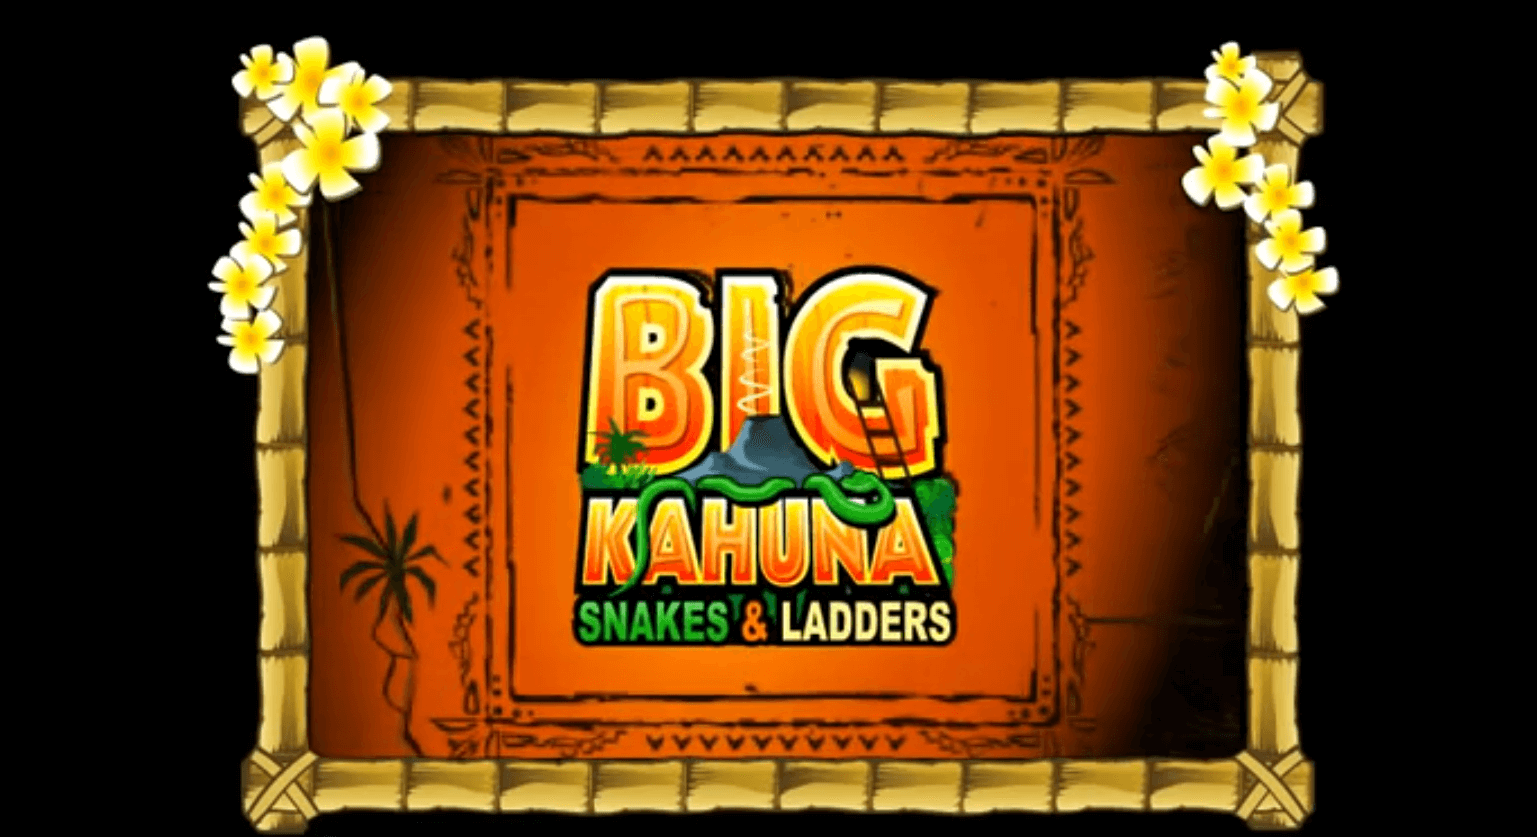 Big Kahuna - Snakes & Ladders slot